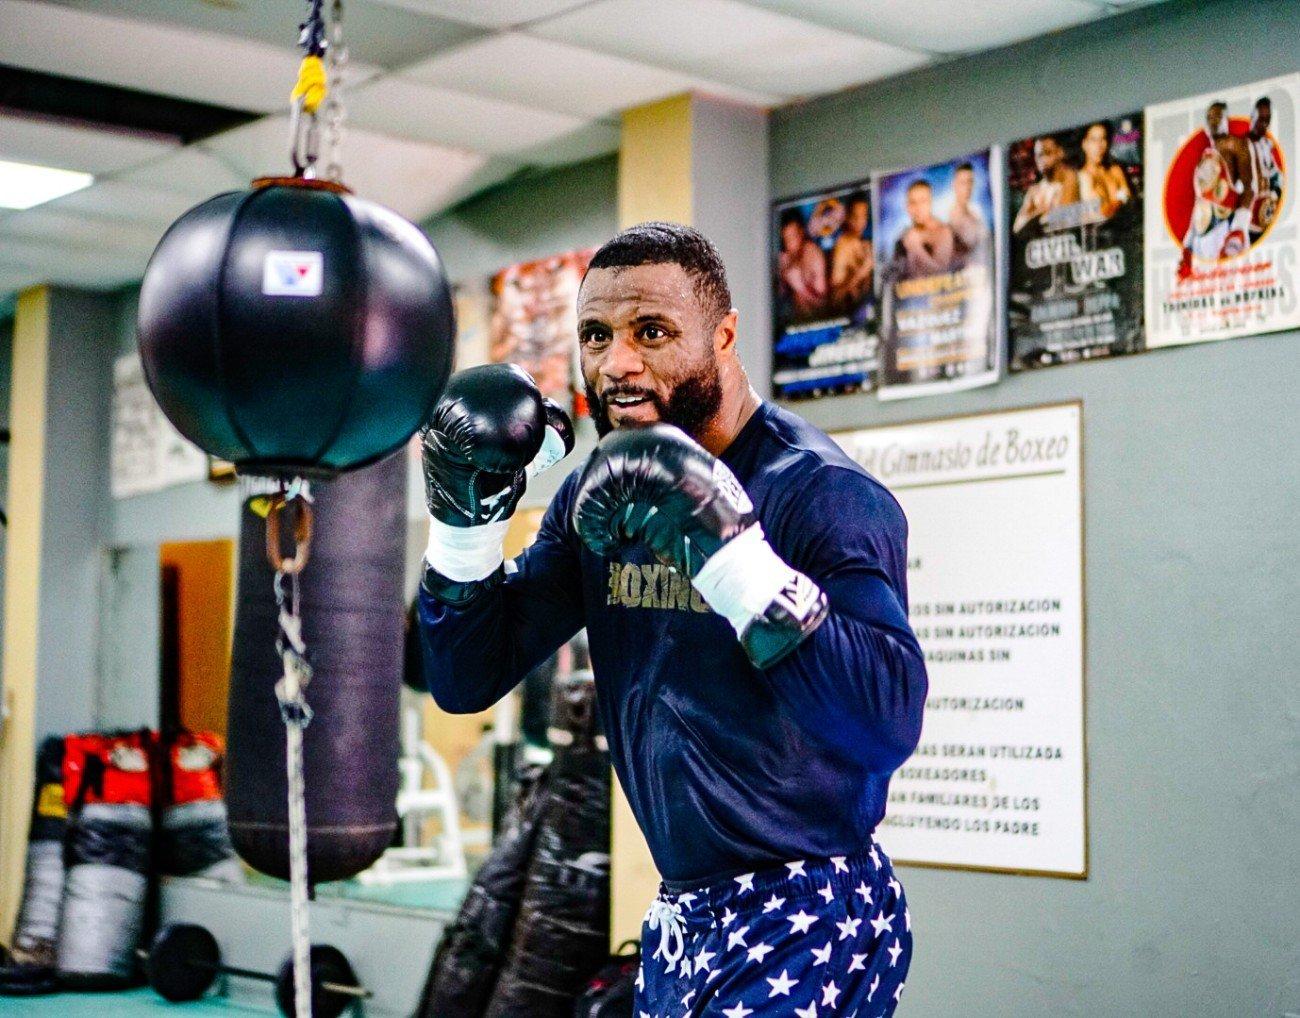 Badou Jack, Floyd Mayweather Jr, Jarrett Hurd, Jean Pascal, Logan Paul, Luis Arias - Boxing News